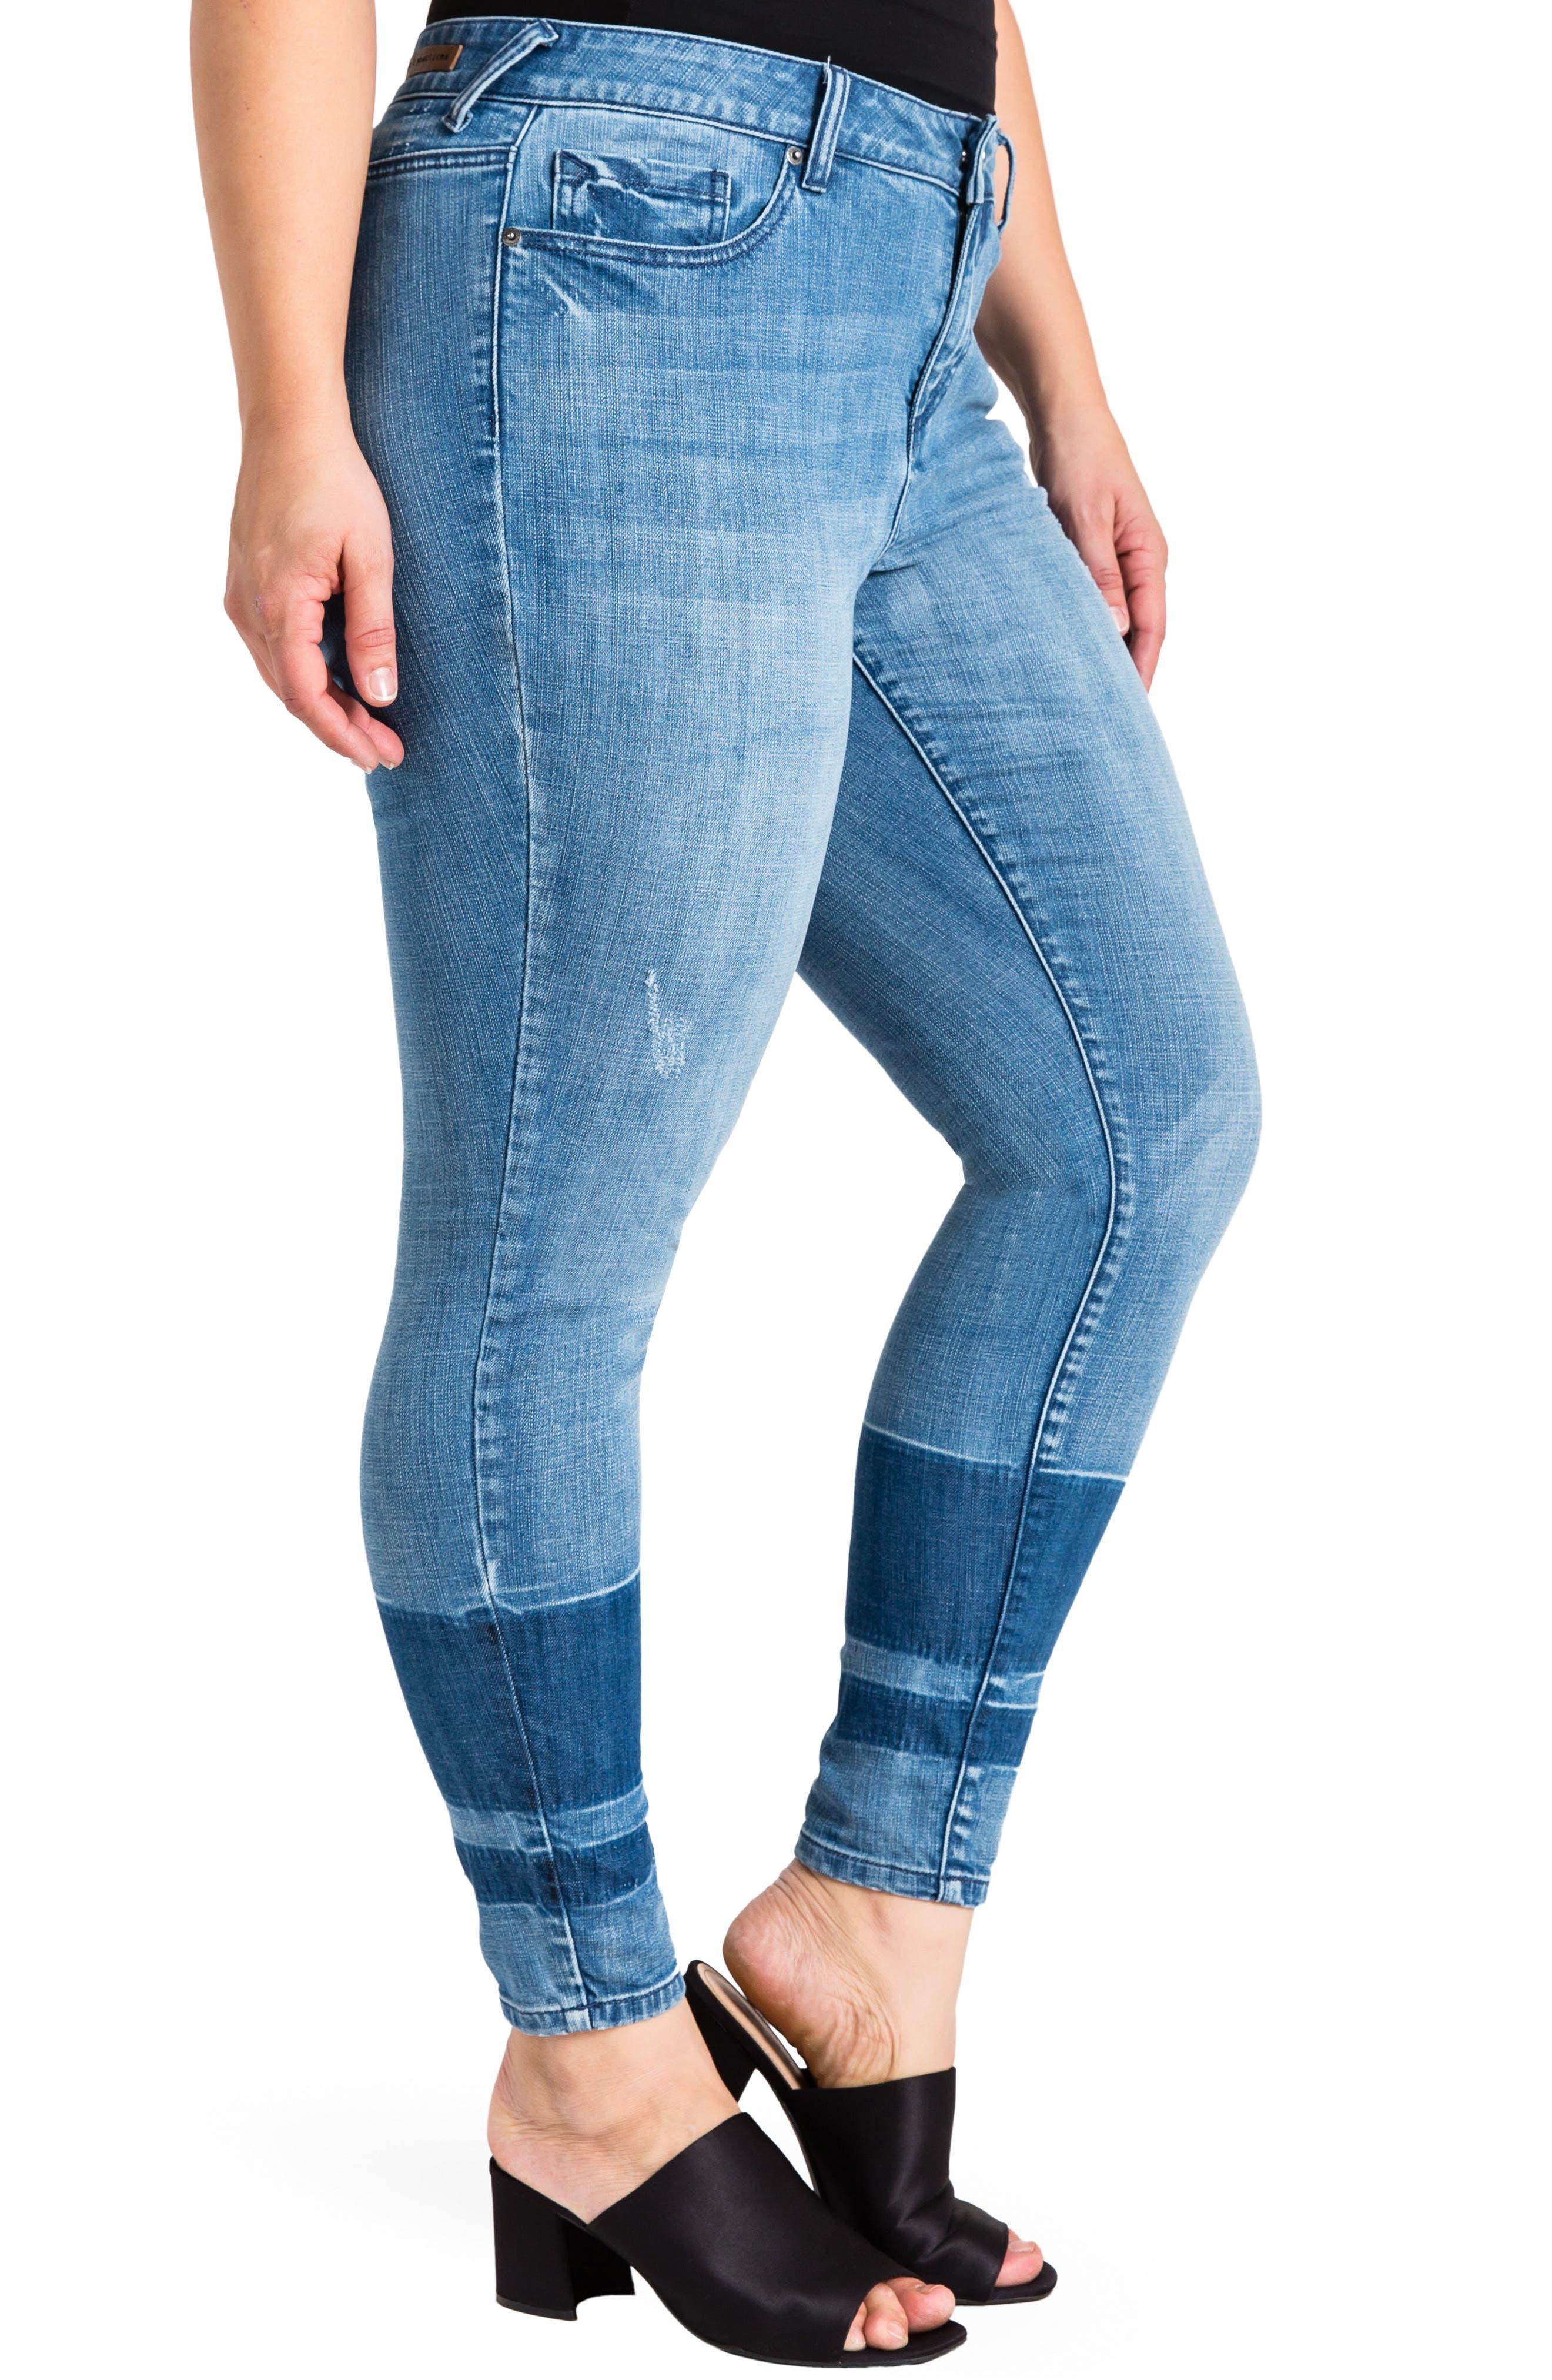 Virginia Ankle Skinny Jeans,                             Alternate thumbnail 3, color,                             MEDIUM BLUE